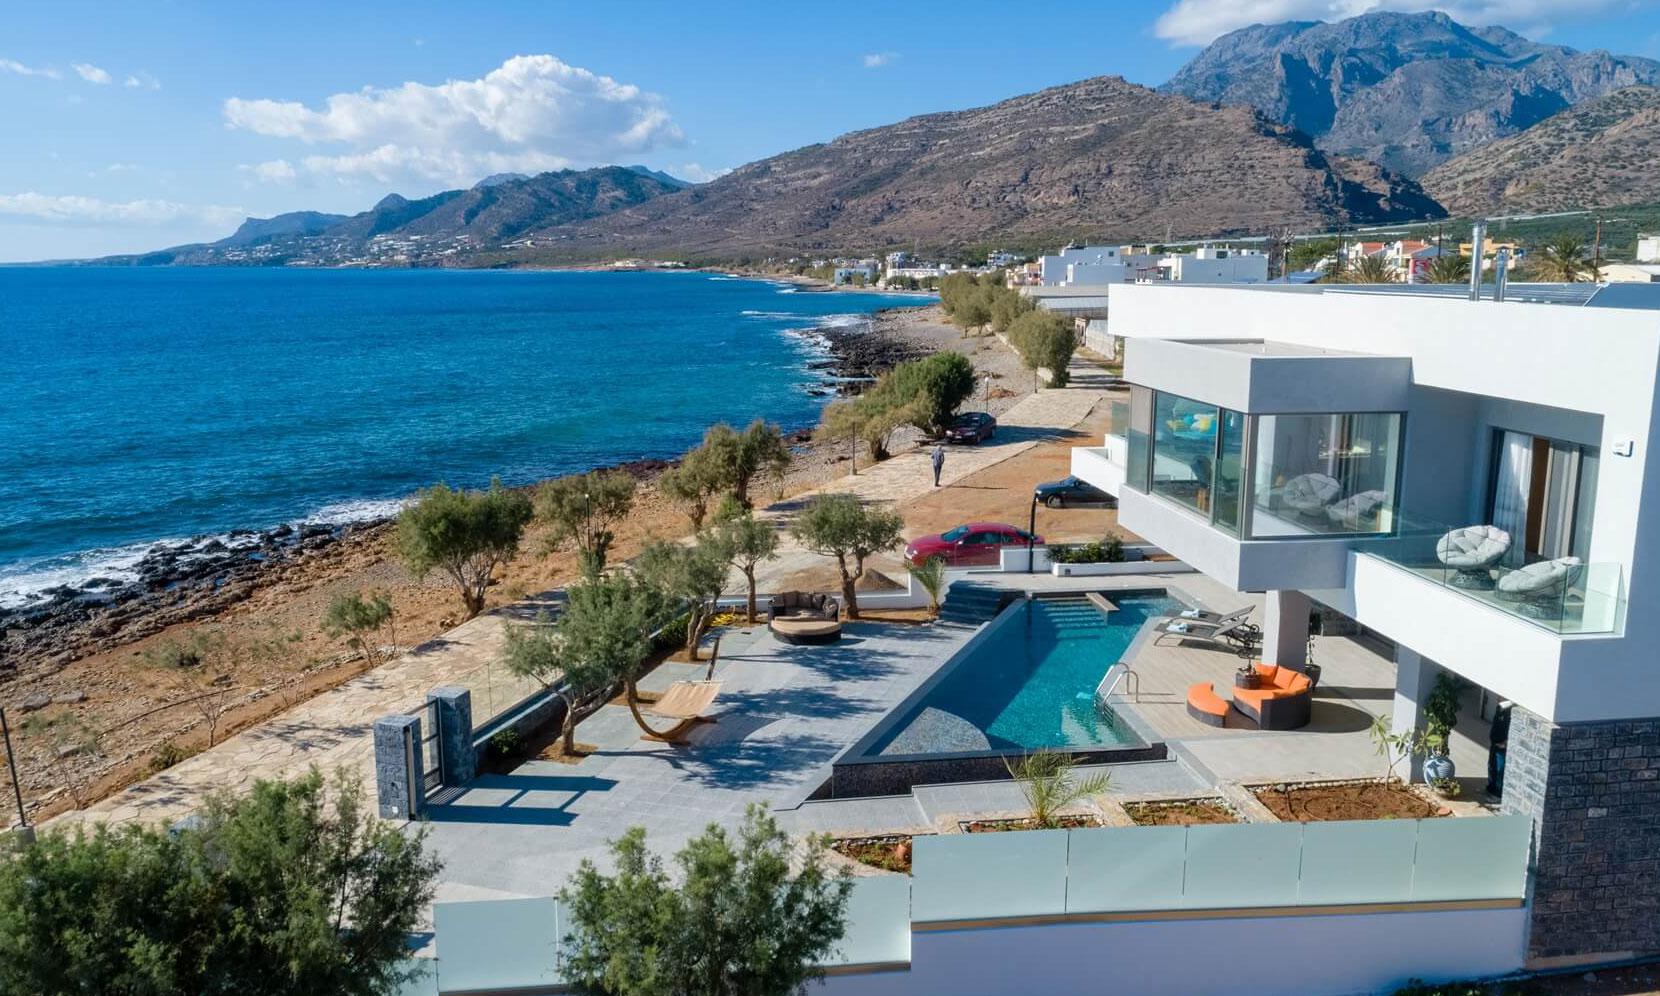 Crete Villa Calista jumbotron image